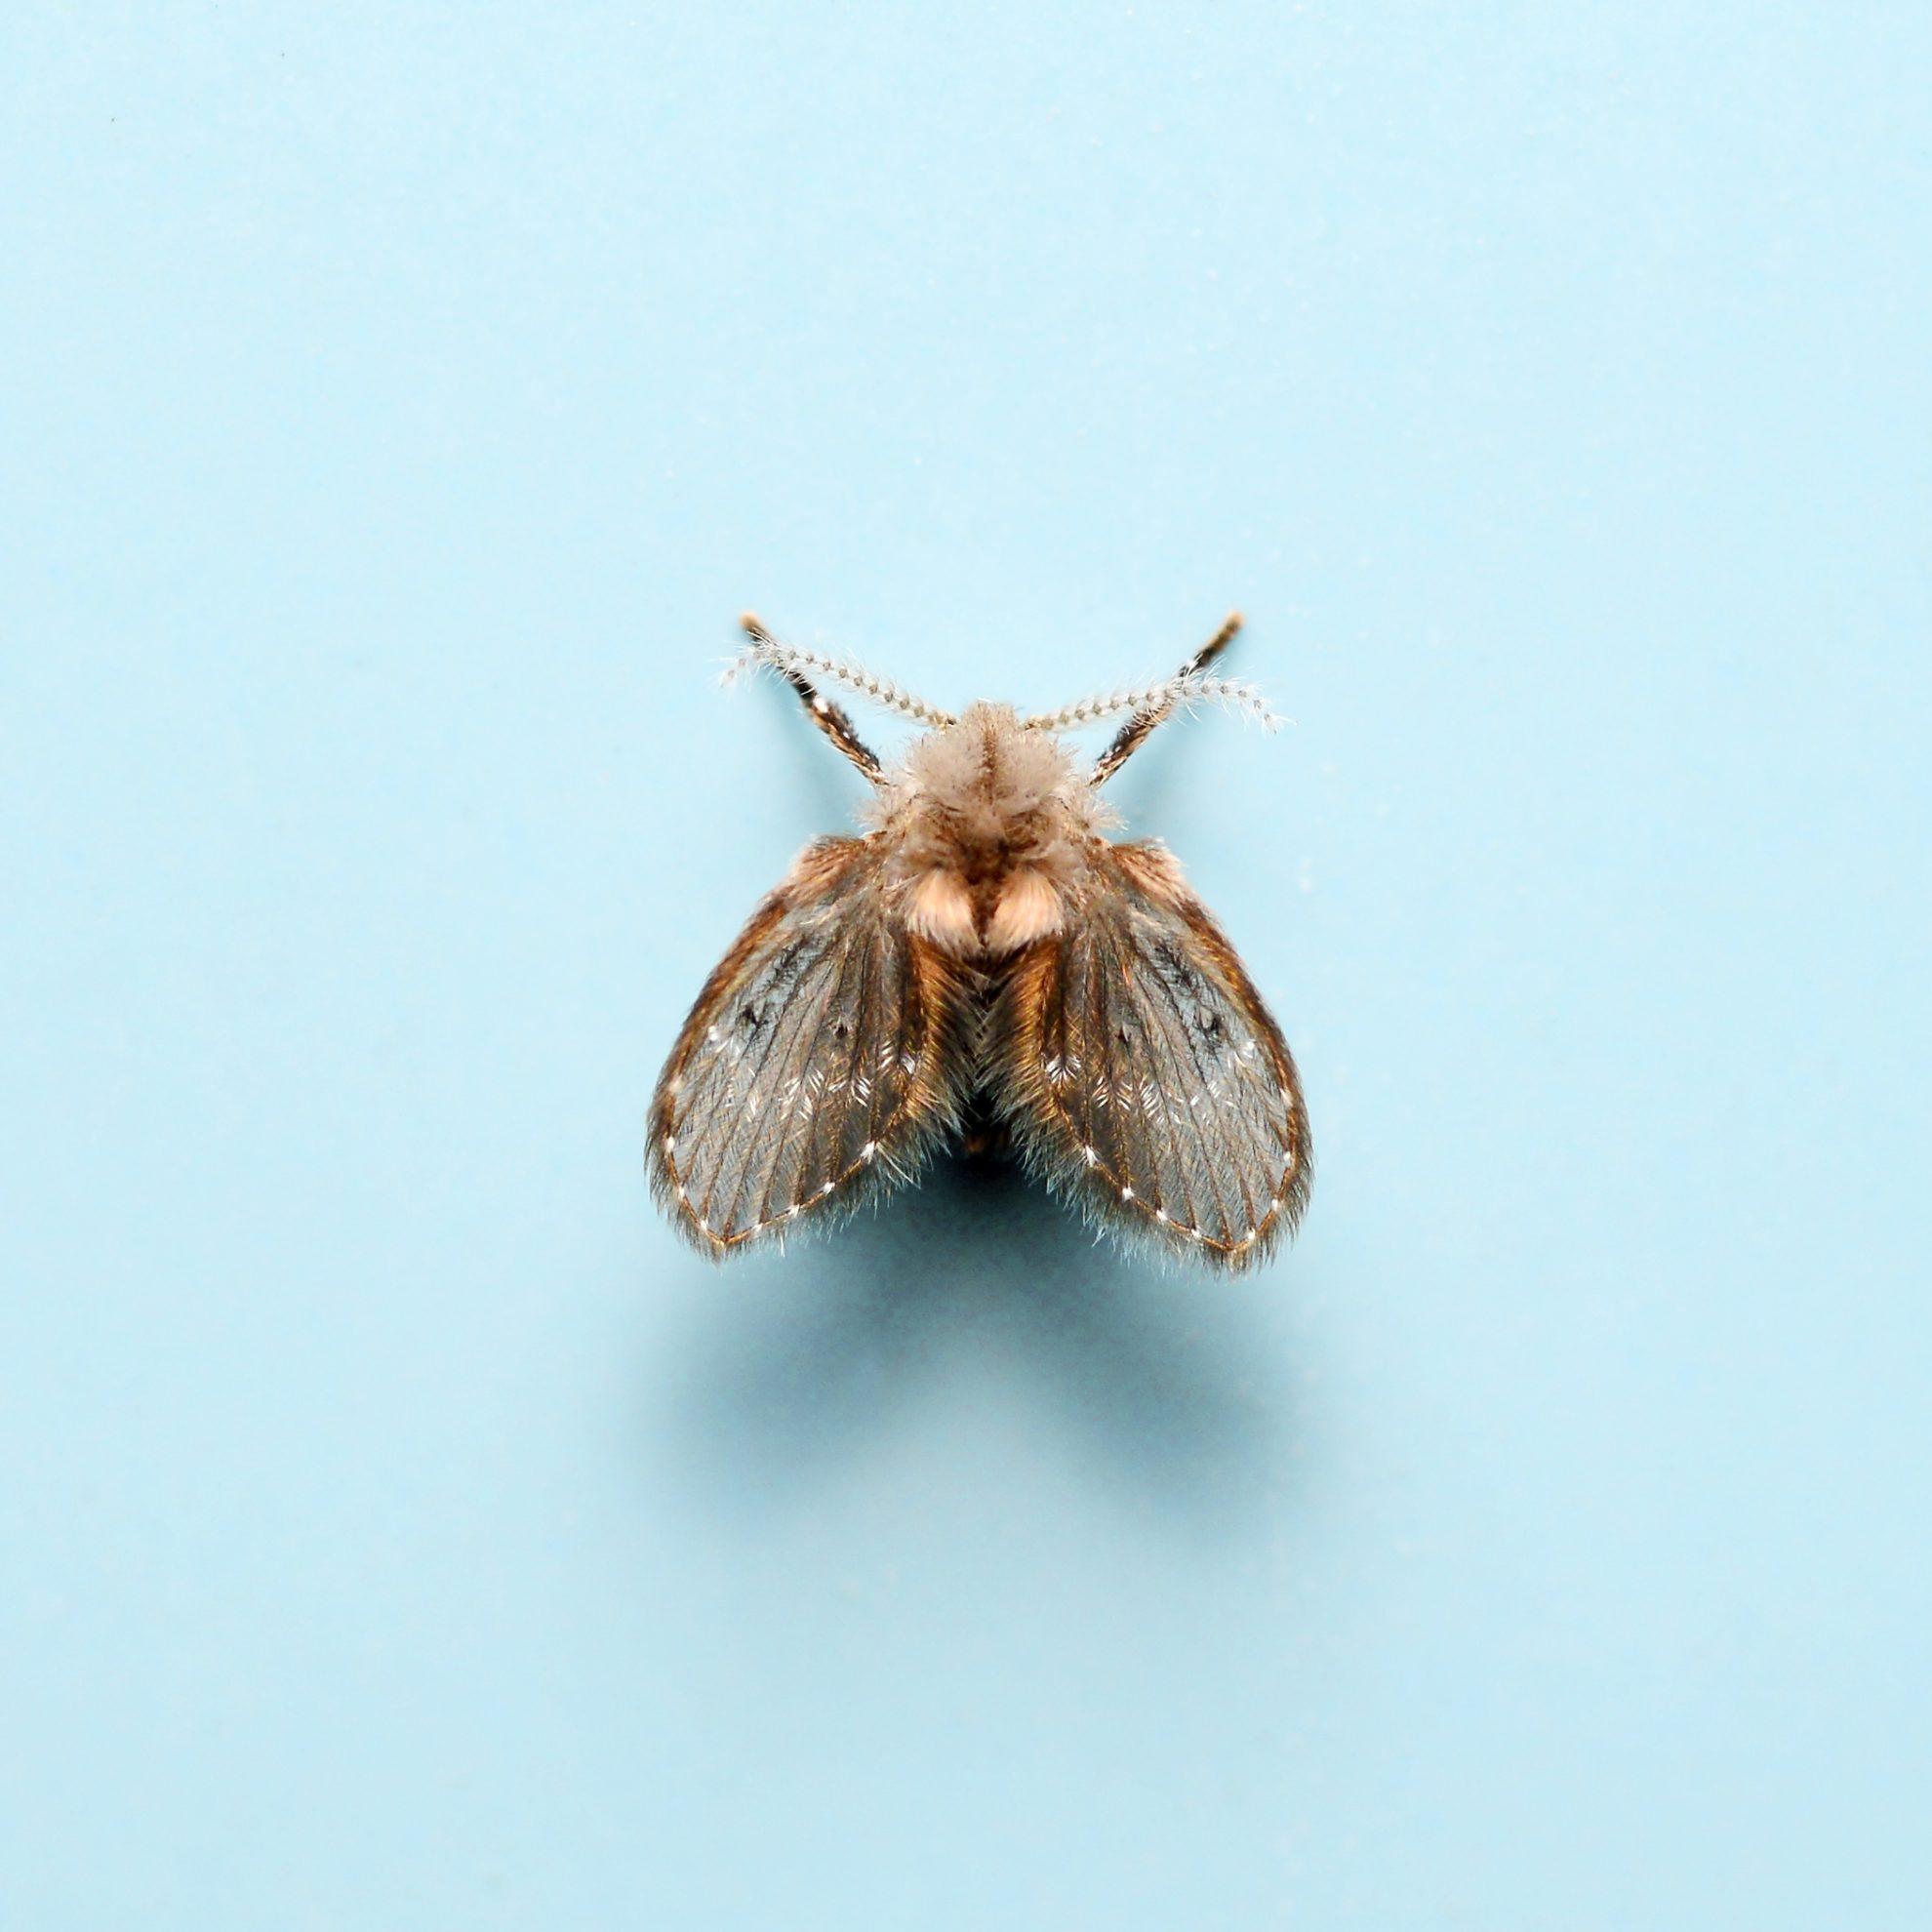 Moth fly or drain fly (Clogmia albipunctata / O: Diptera, F: Psy